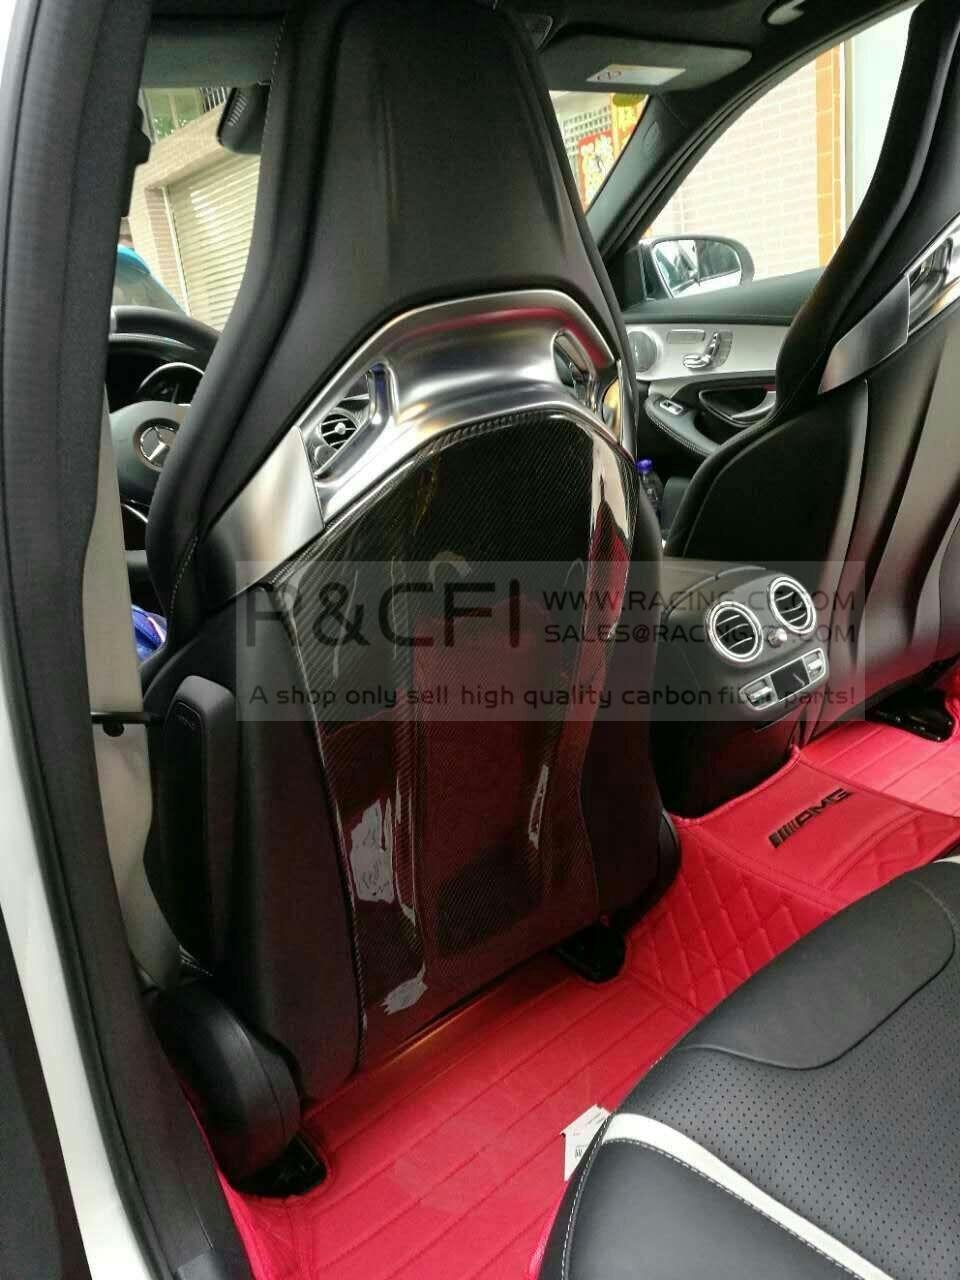 DRY Carbon Fiber Seatback Shell Covers//4pcs/set For W205 C63 AMG CLA45 GLA45